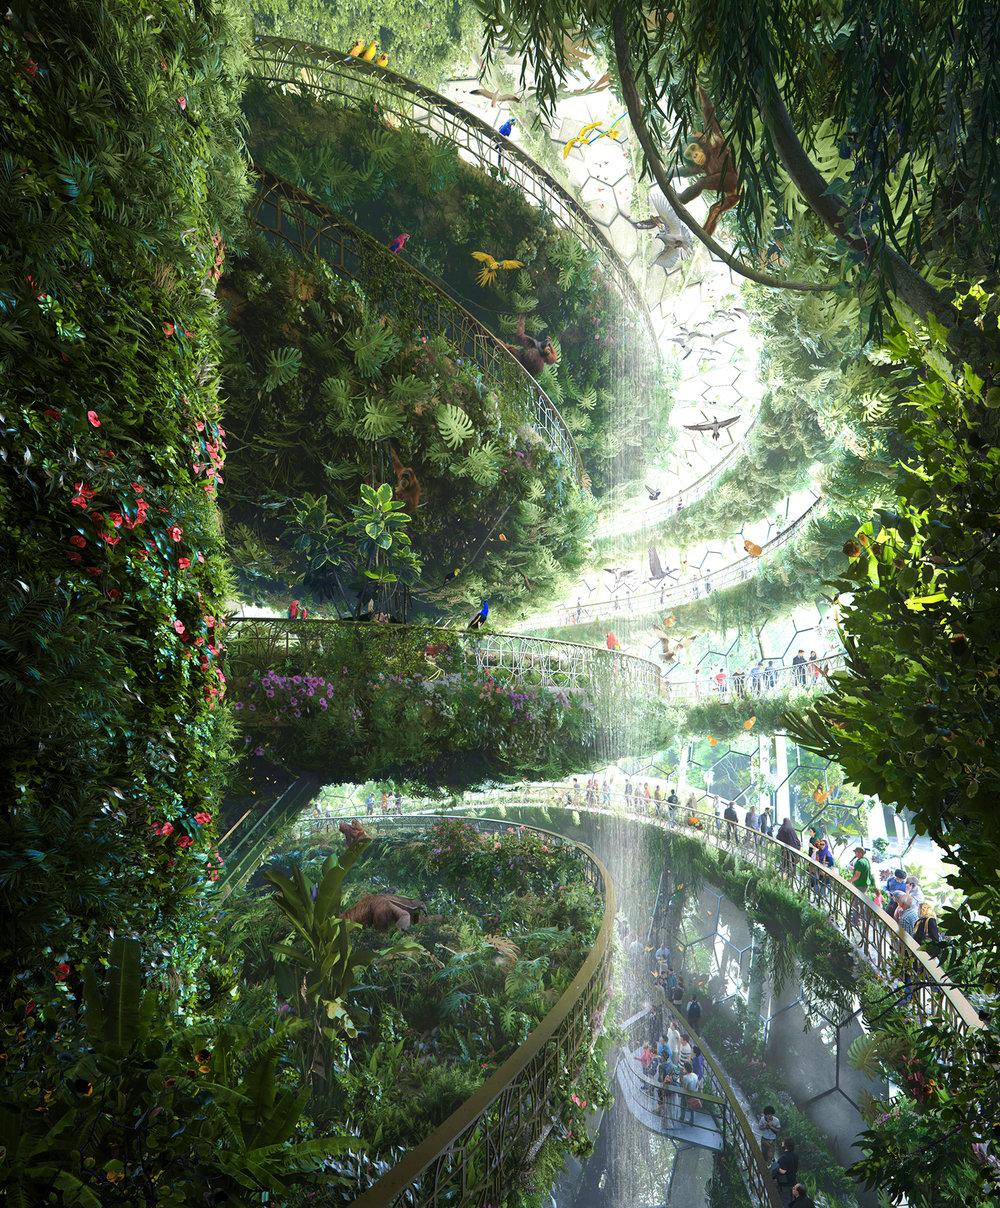 Zas_Iran-rainforest_Tropical Levels-option-low.jpg